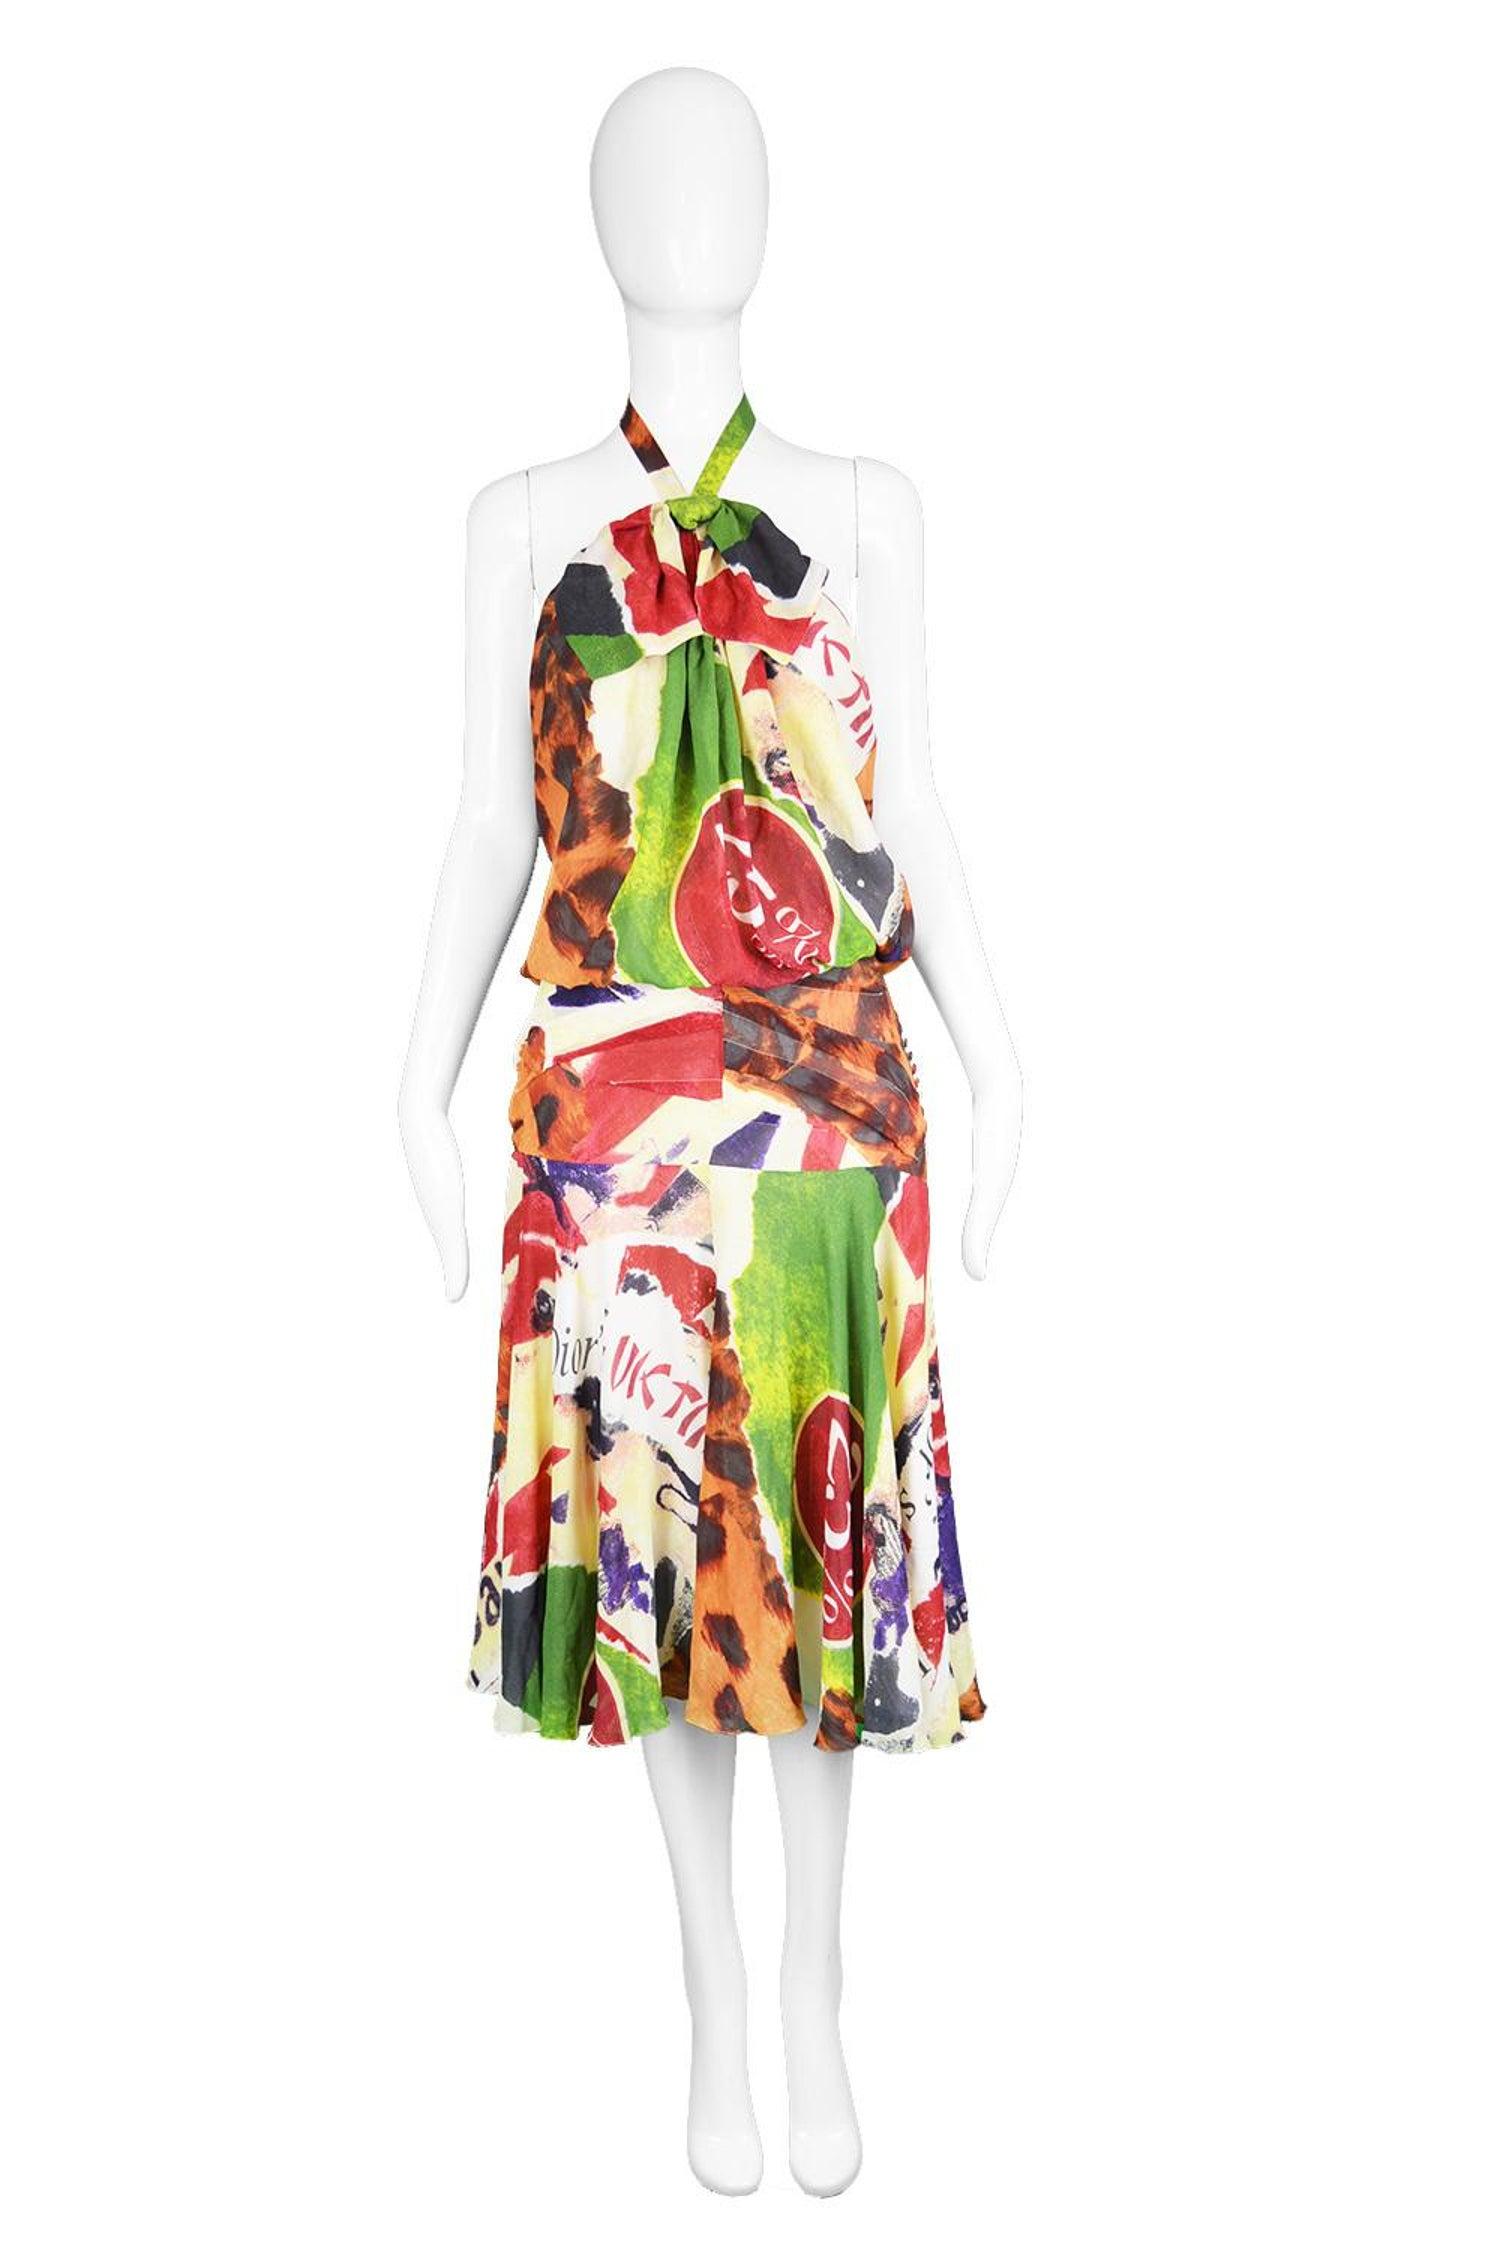 2d4aa230b91 Christian Dior by John Galliano Iconic  Fashion Victim  Silk Dress ...